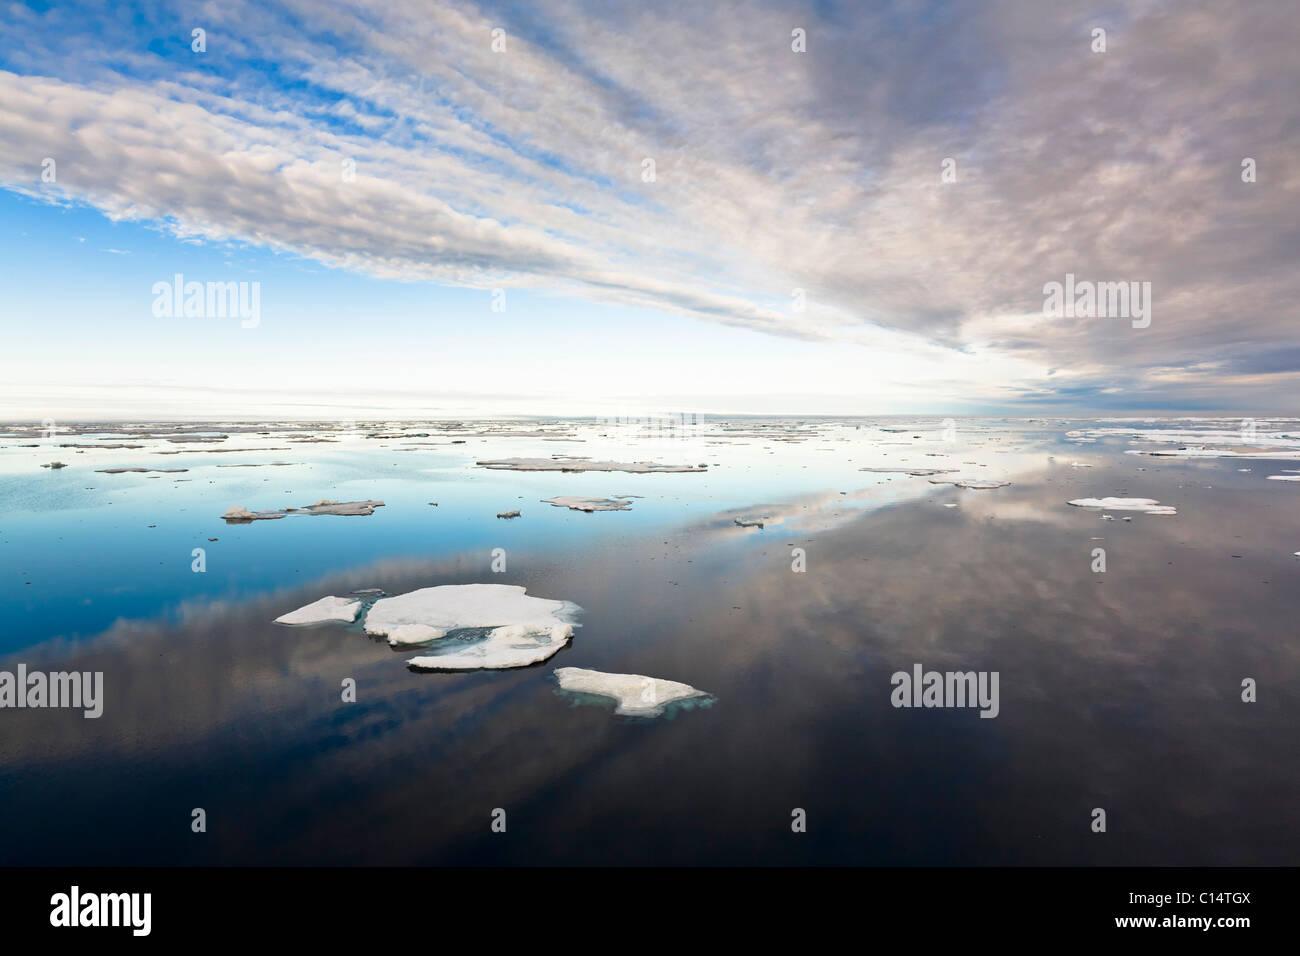 Pack ice in Barrow Strait, Qikiqtaaluk Region, Nunavut, Canada. - Stock Image